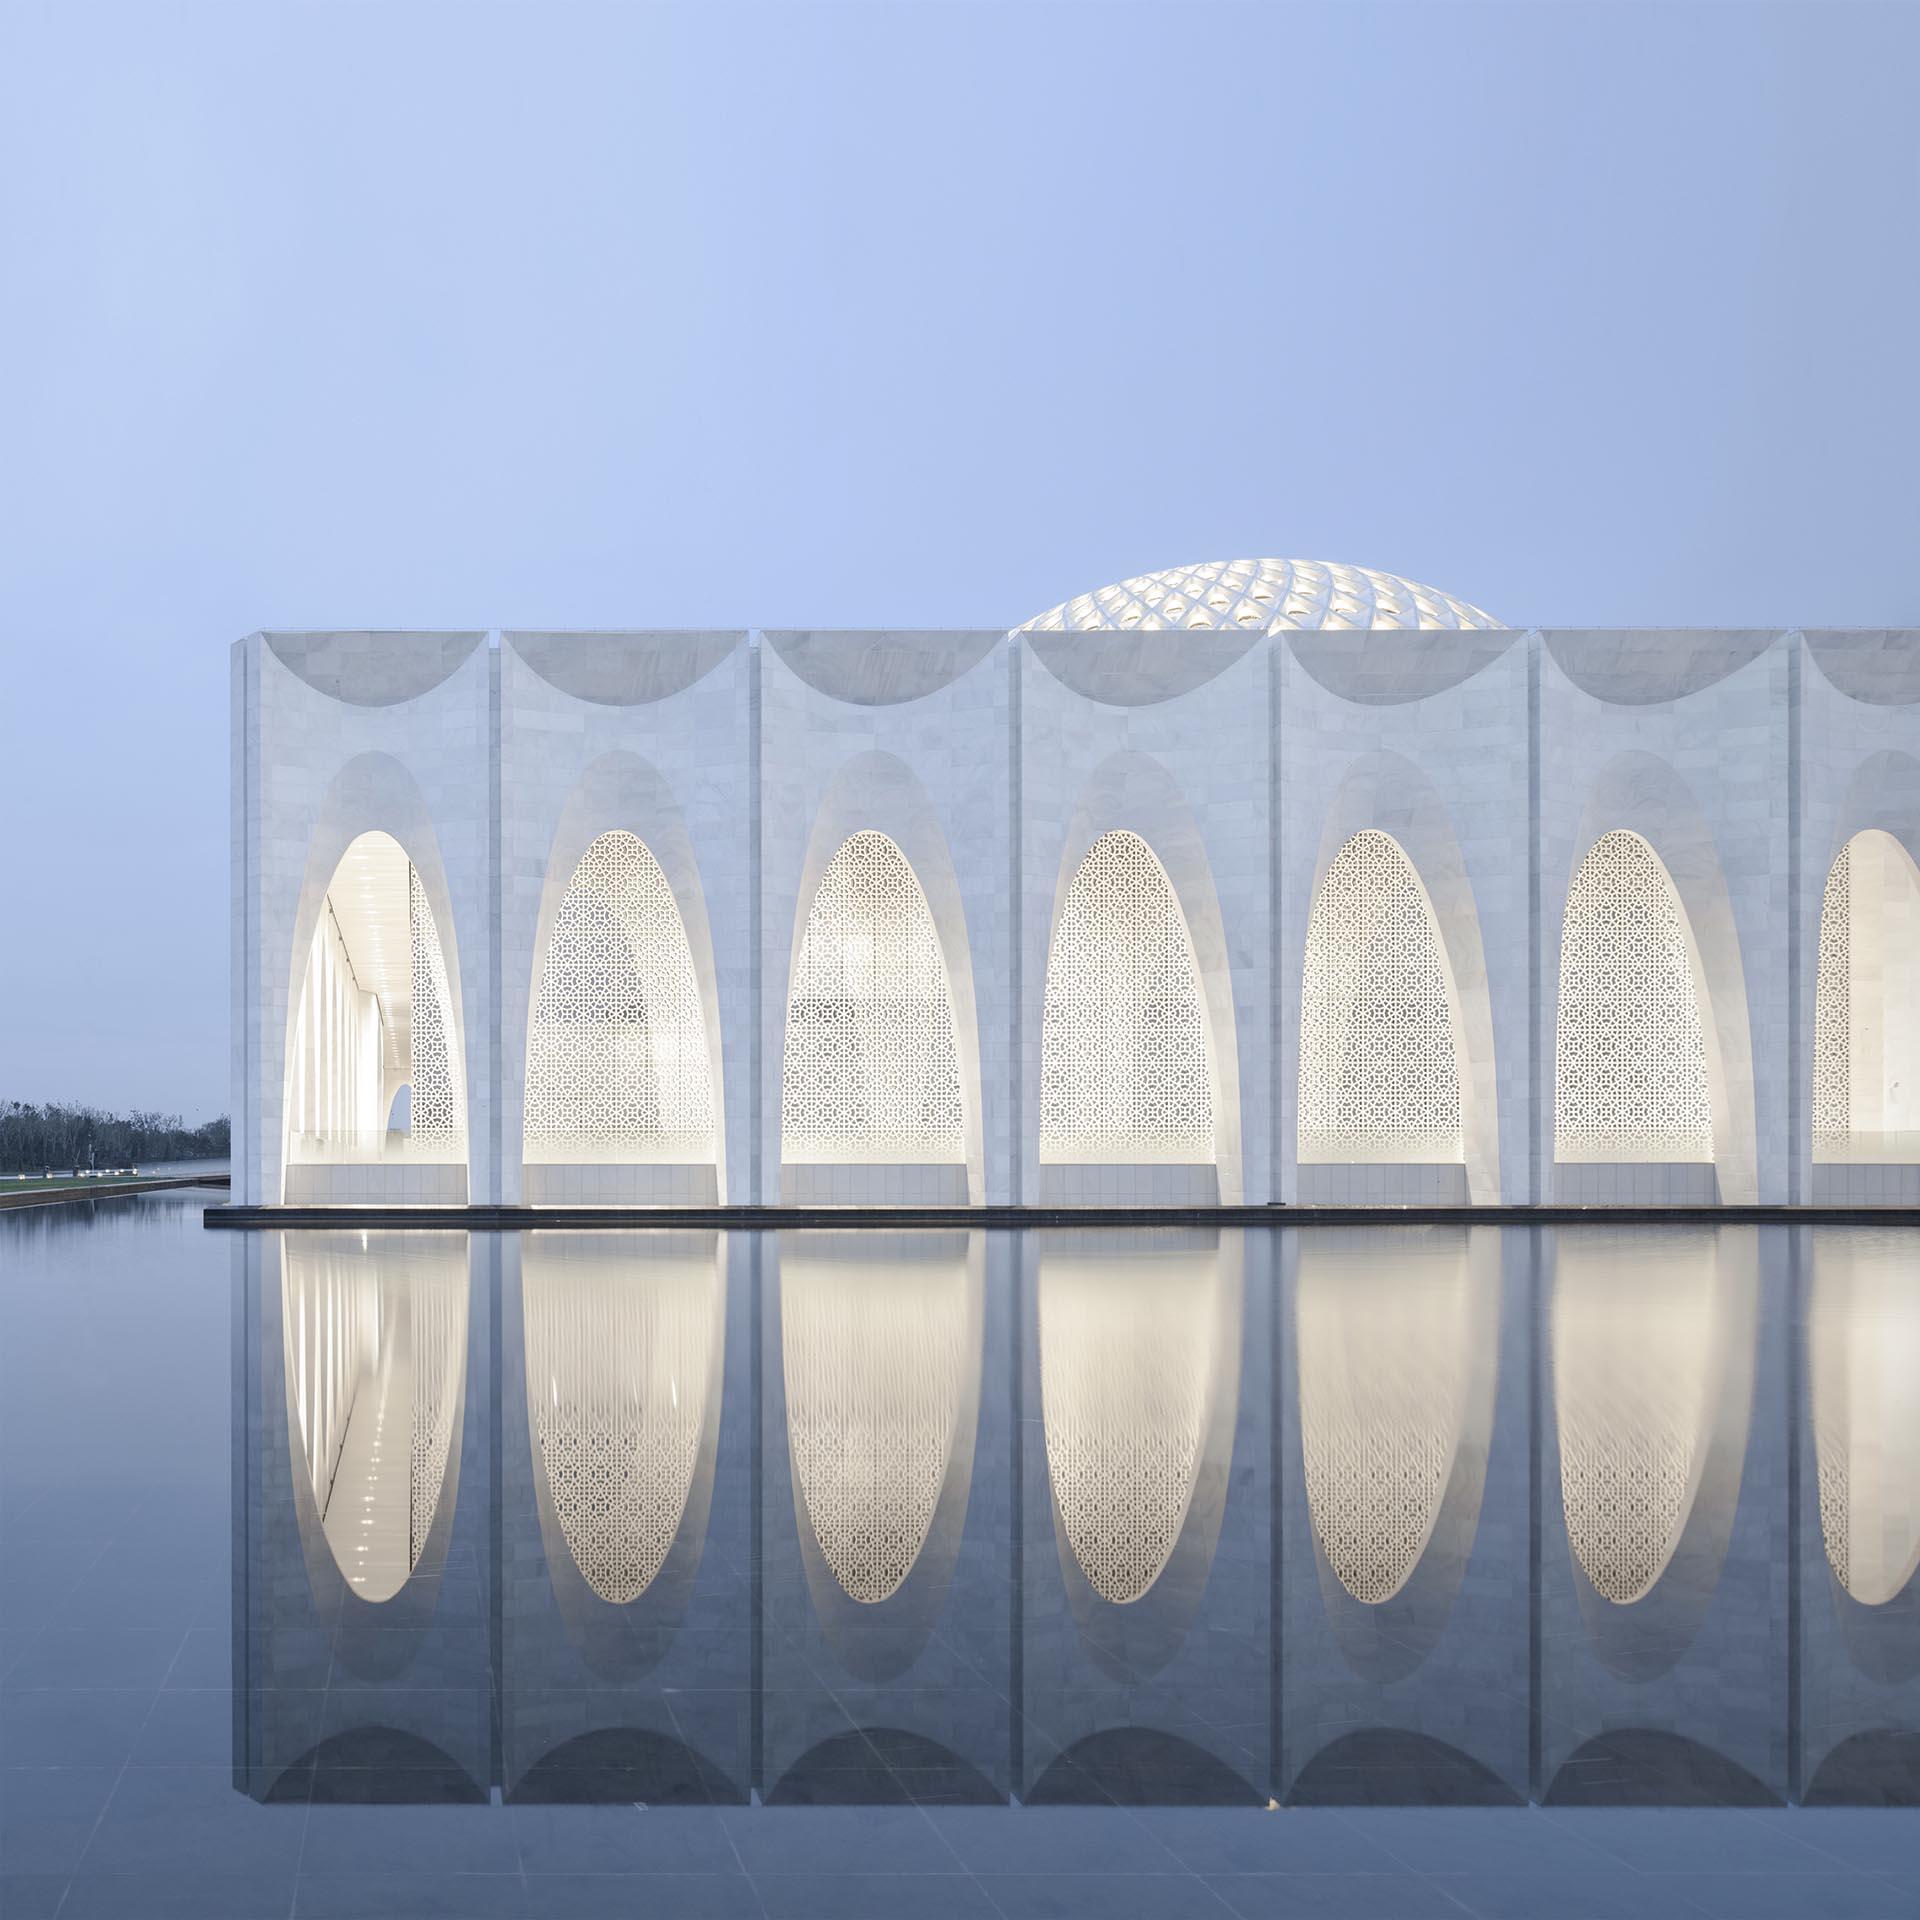 Da Chang Muslim Cultural Center by Hejingtang Studio